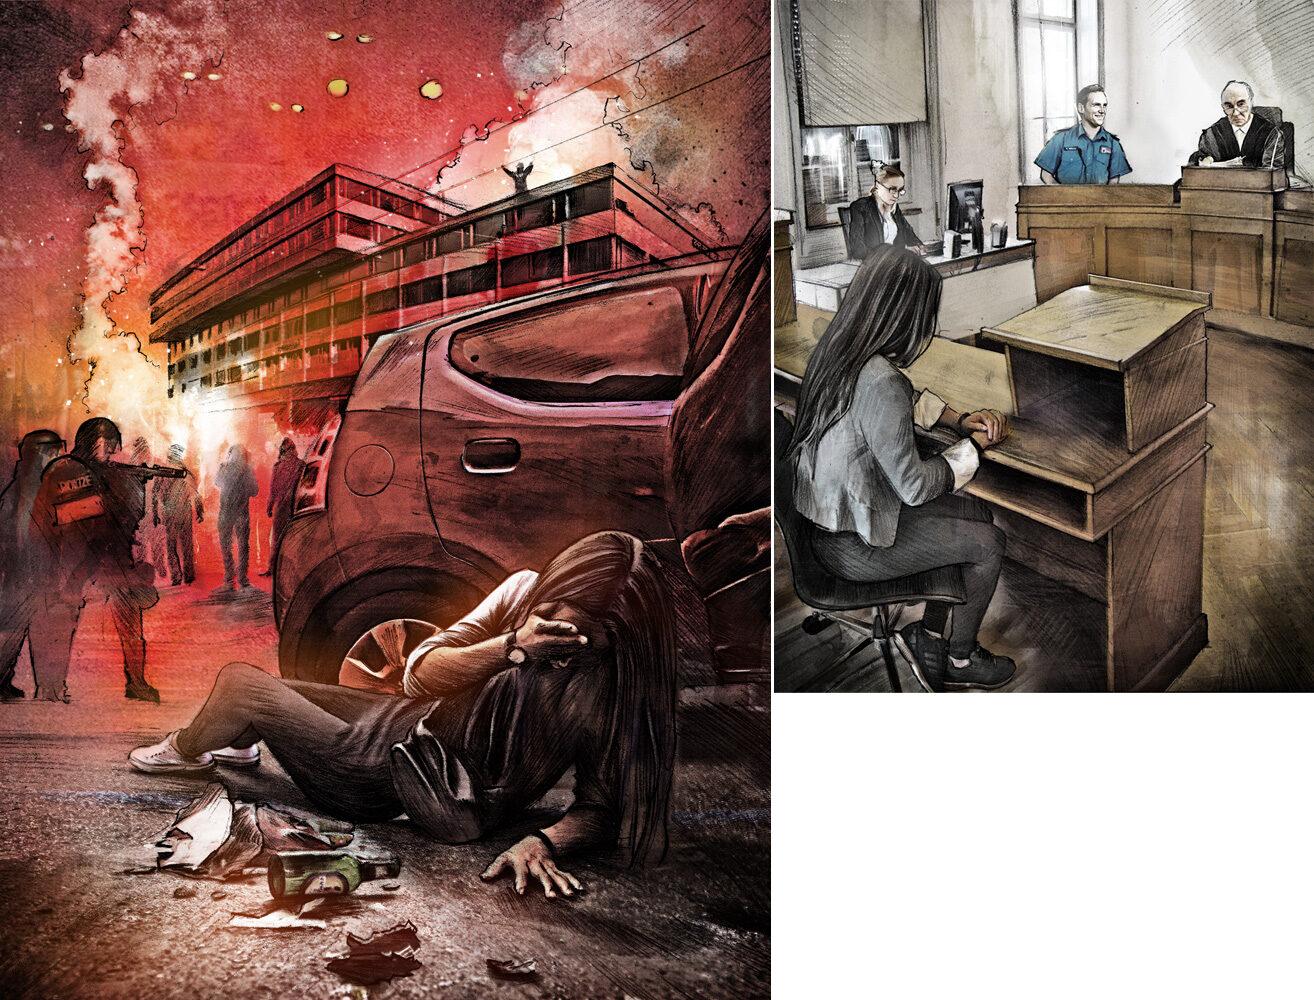 Tanz dich frei - Kornel Illustration | Kornel Stadler portfolio